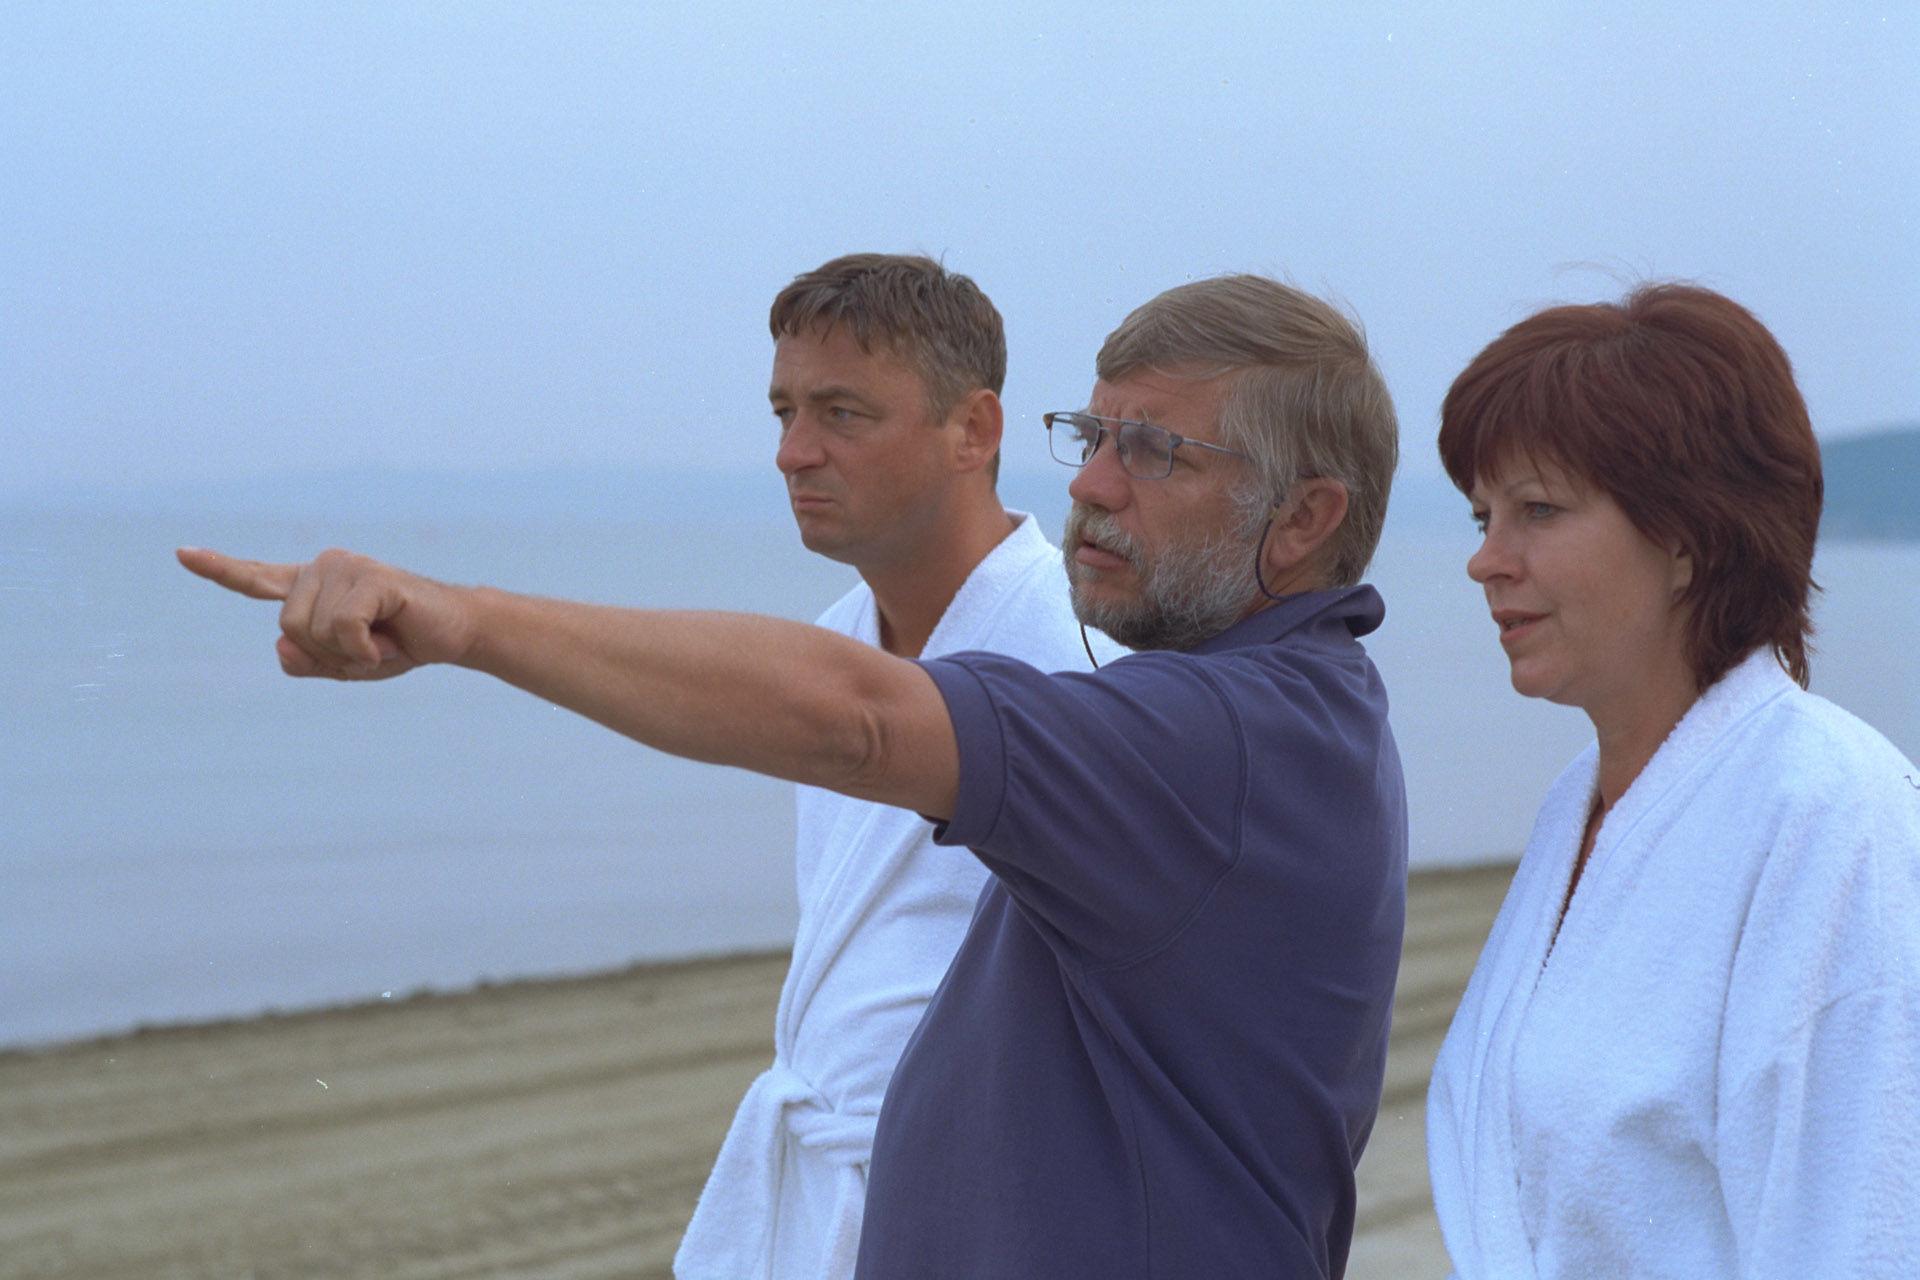 Andreas Vitasek (Sigi), Reinhard Schwabenitzky (Regie), Elfi Eschke (Henny